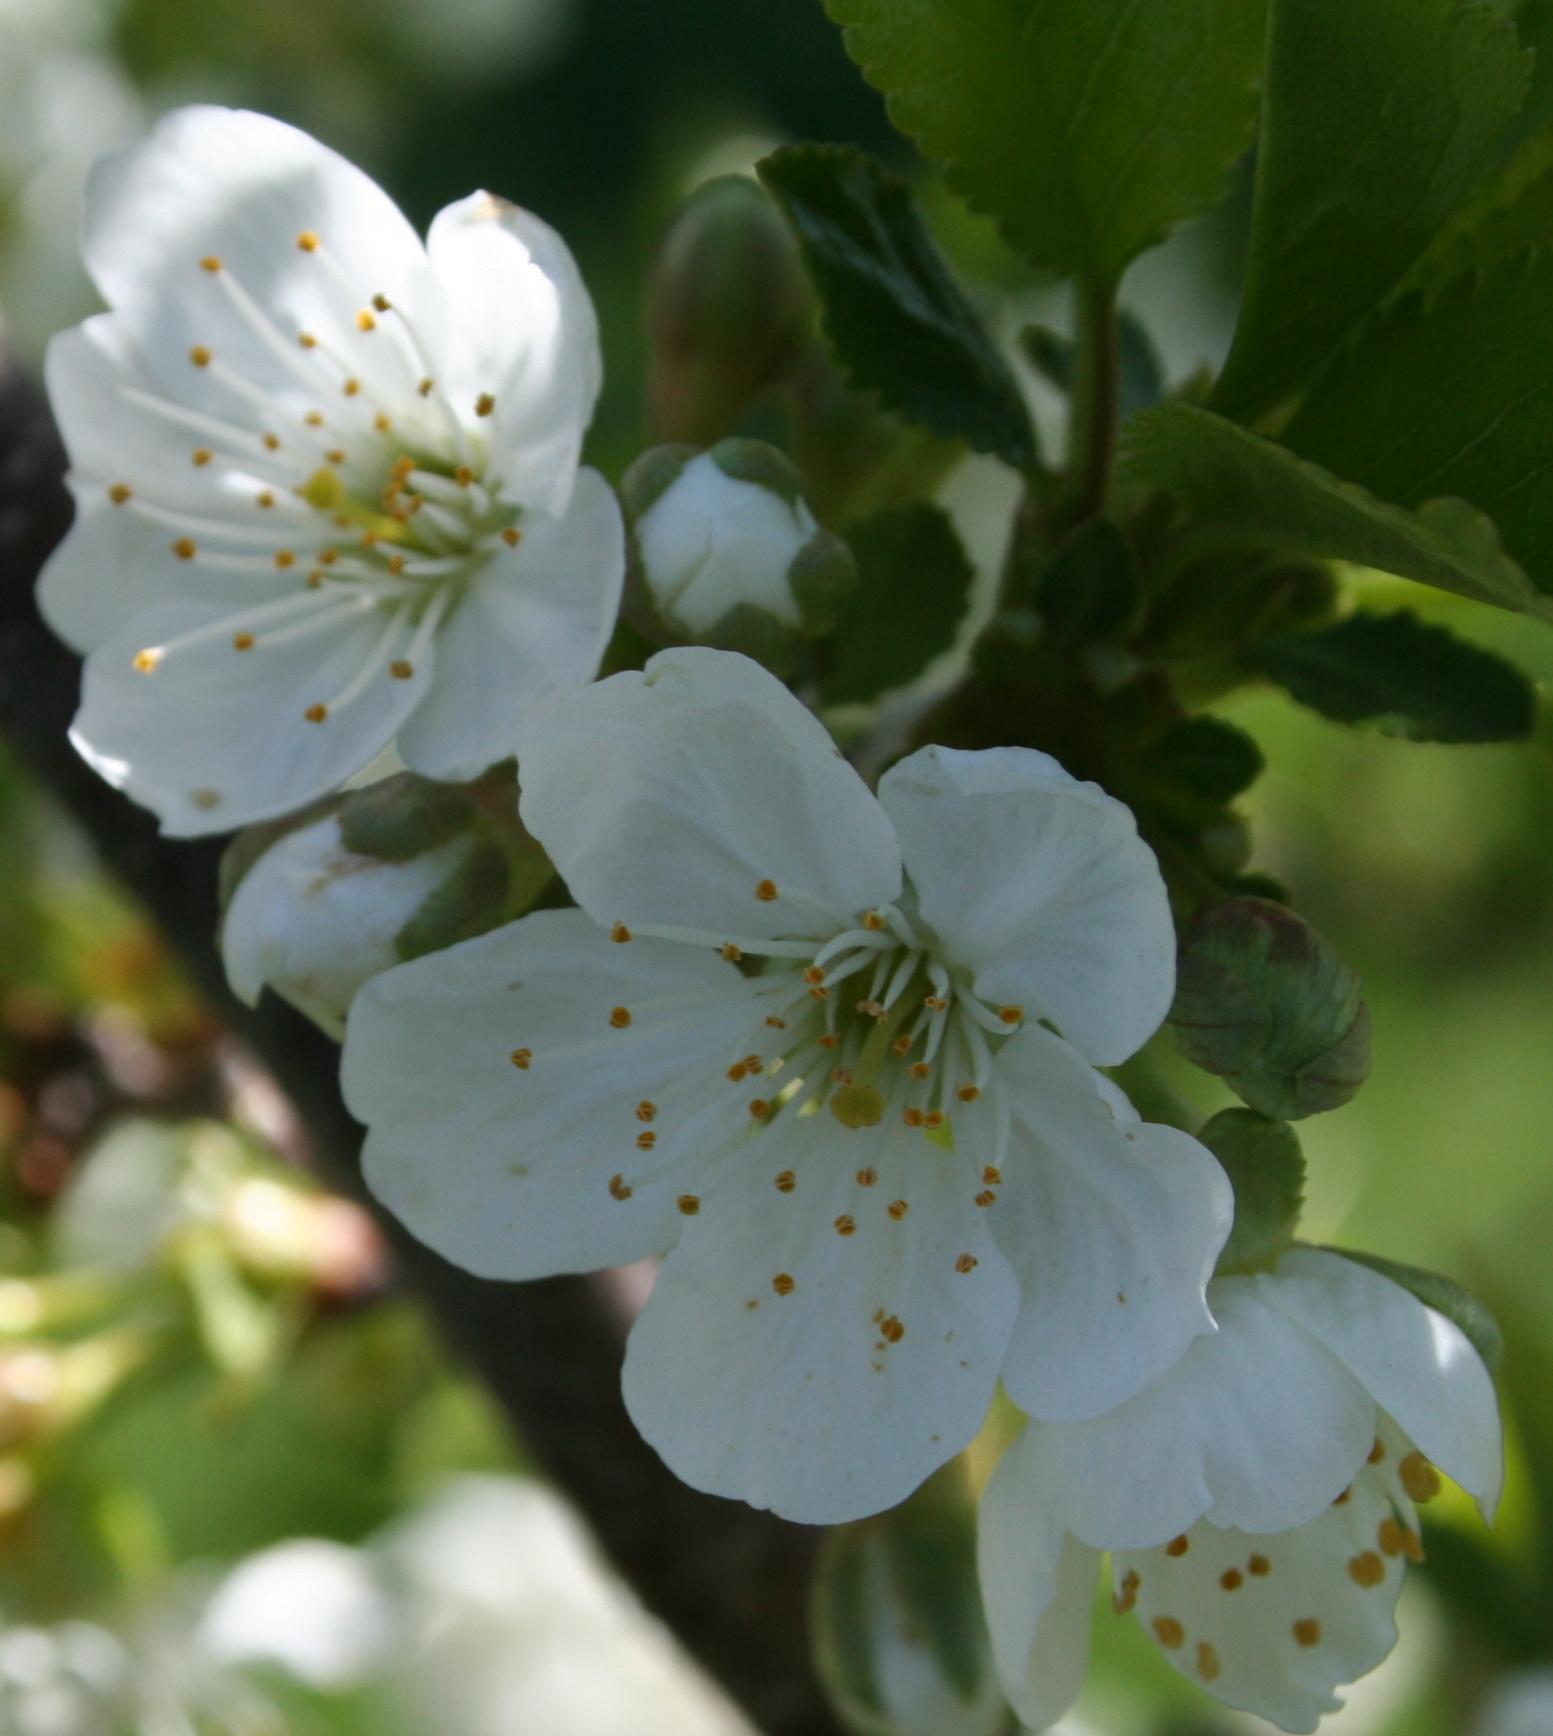 bali cherry blossoms